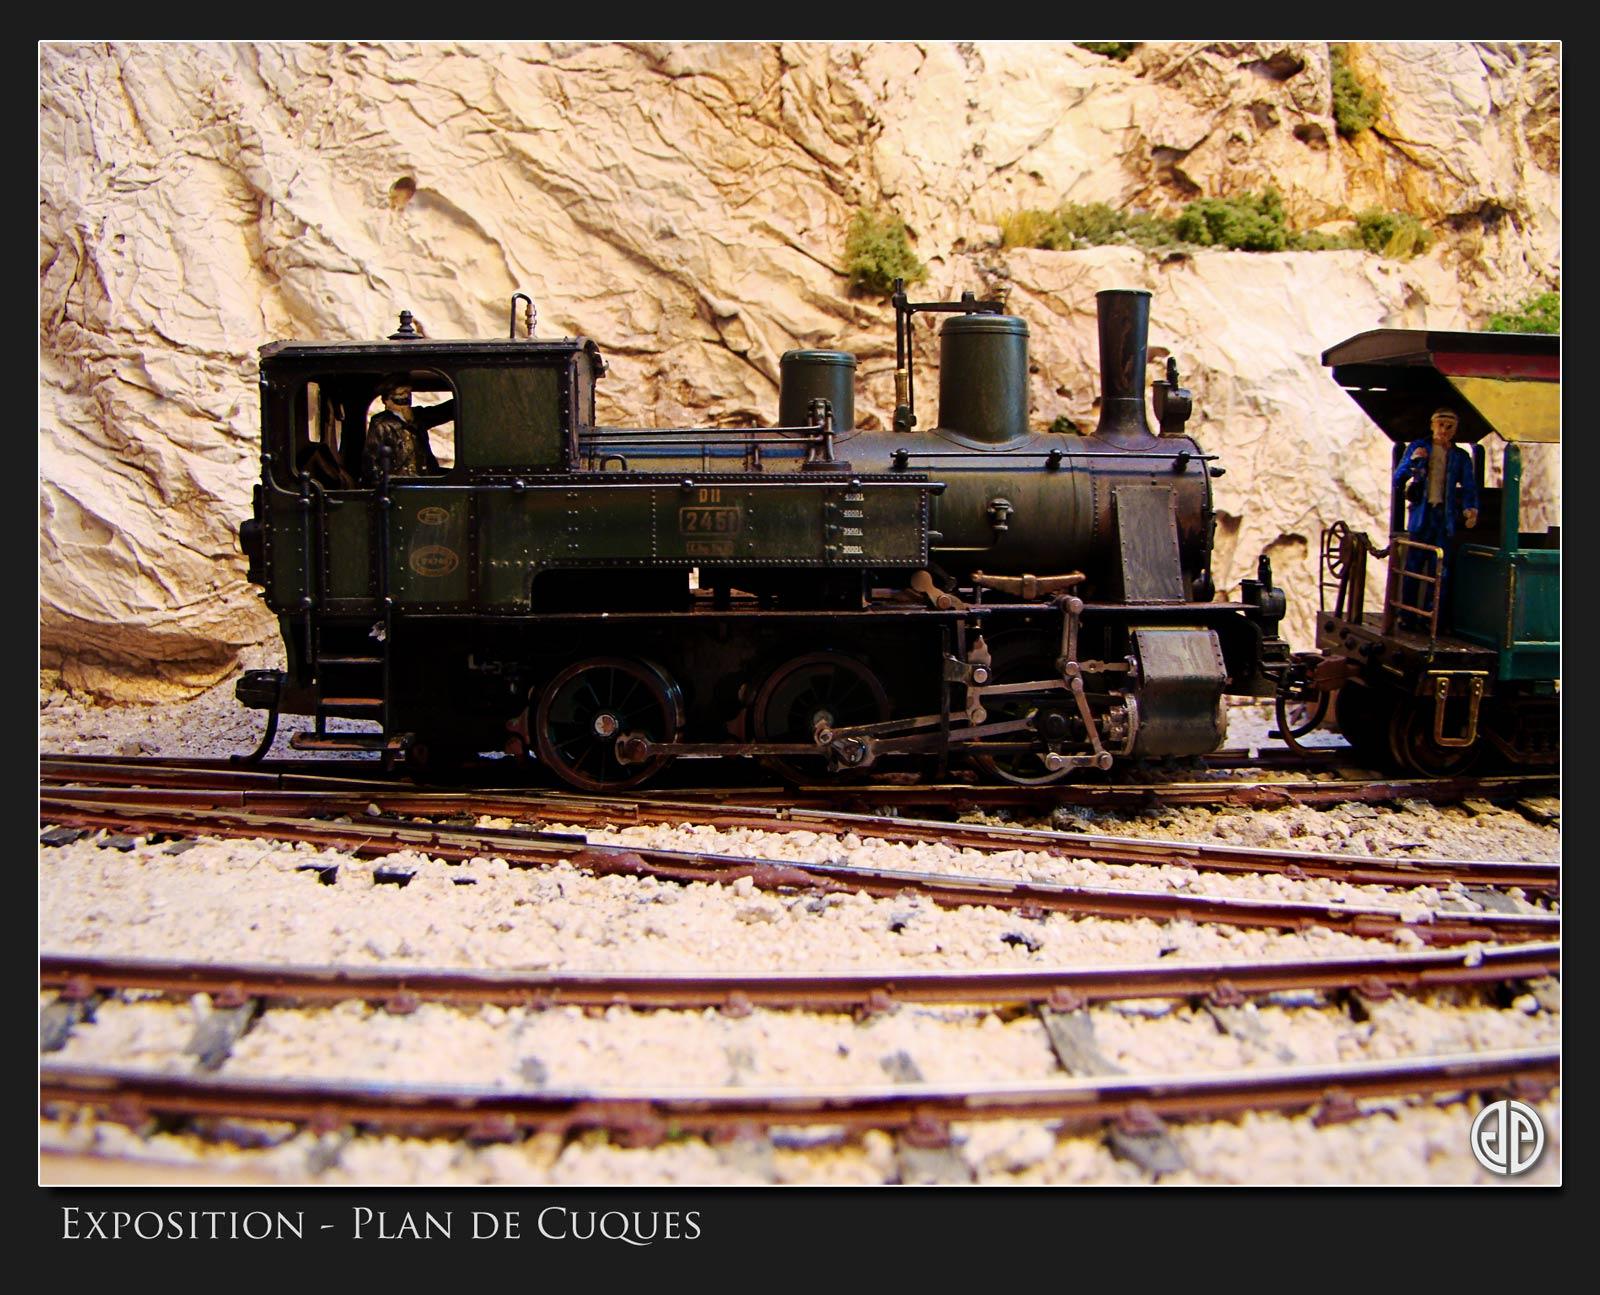 Expo-ferroviaire-Plan-de-Cuques-20